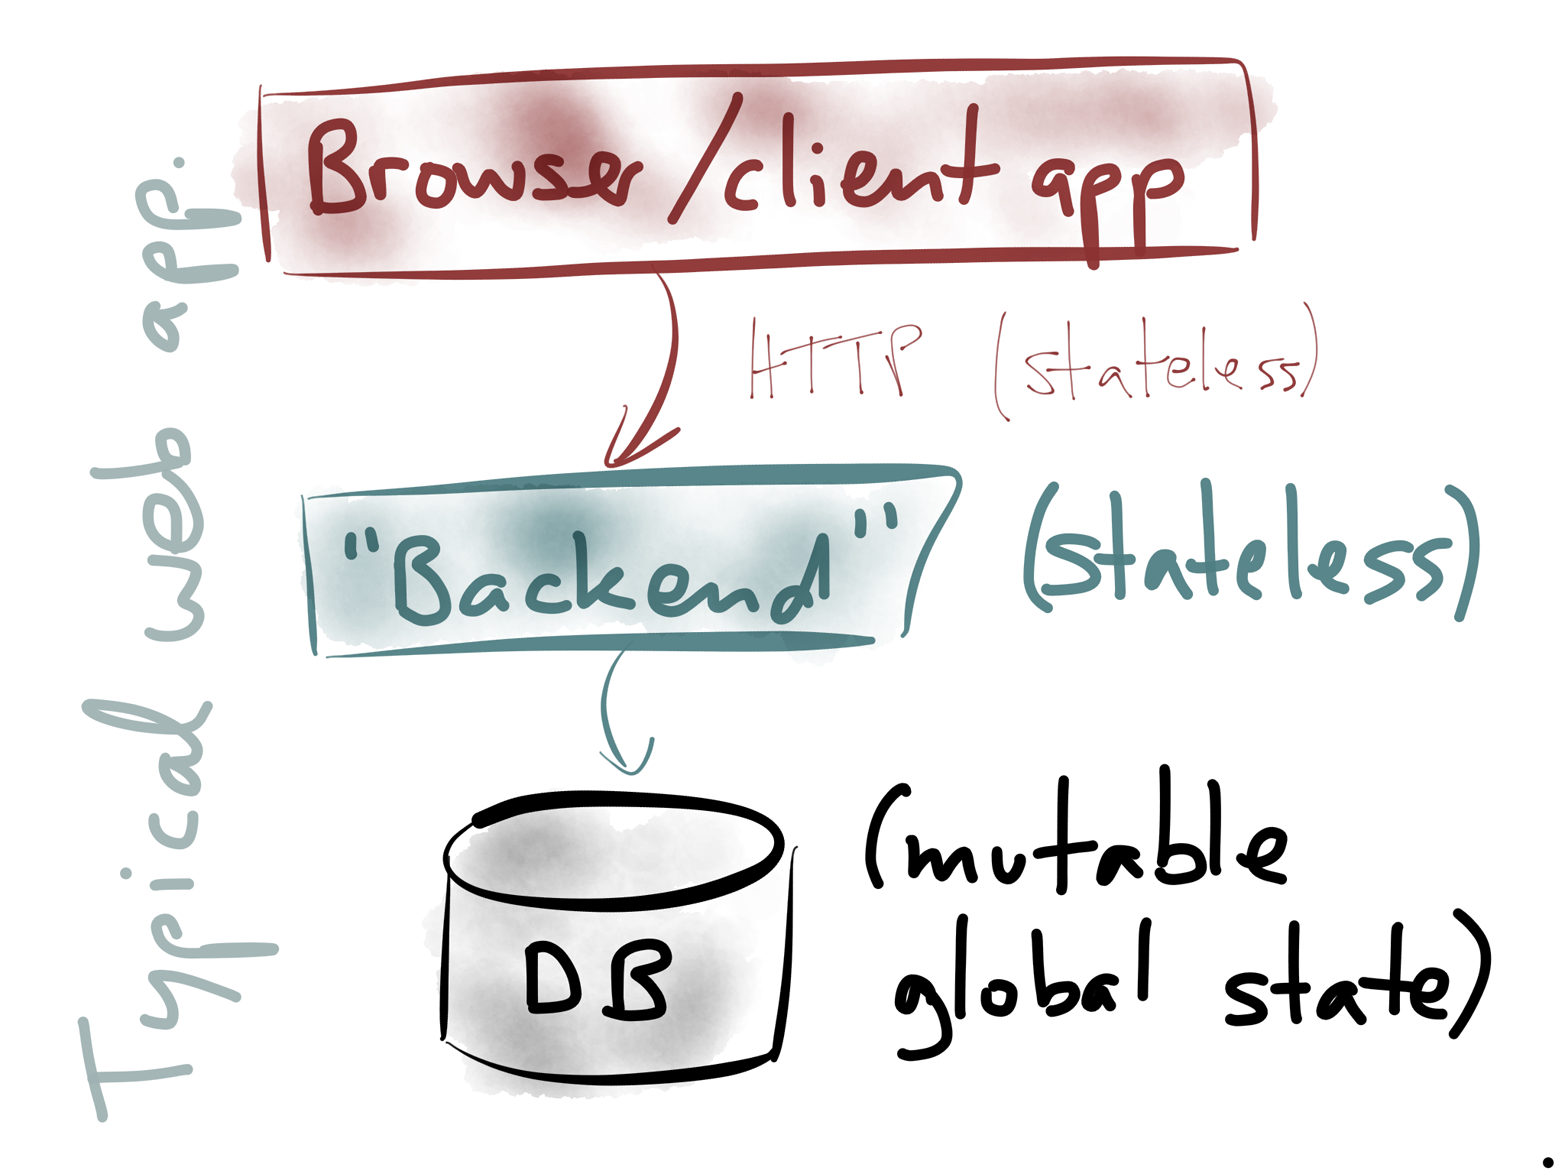 Simplest-case web application architecture.